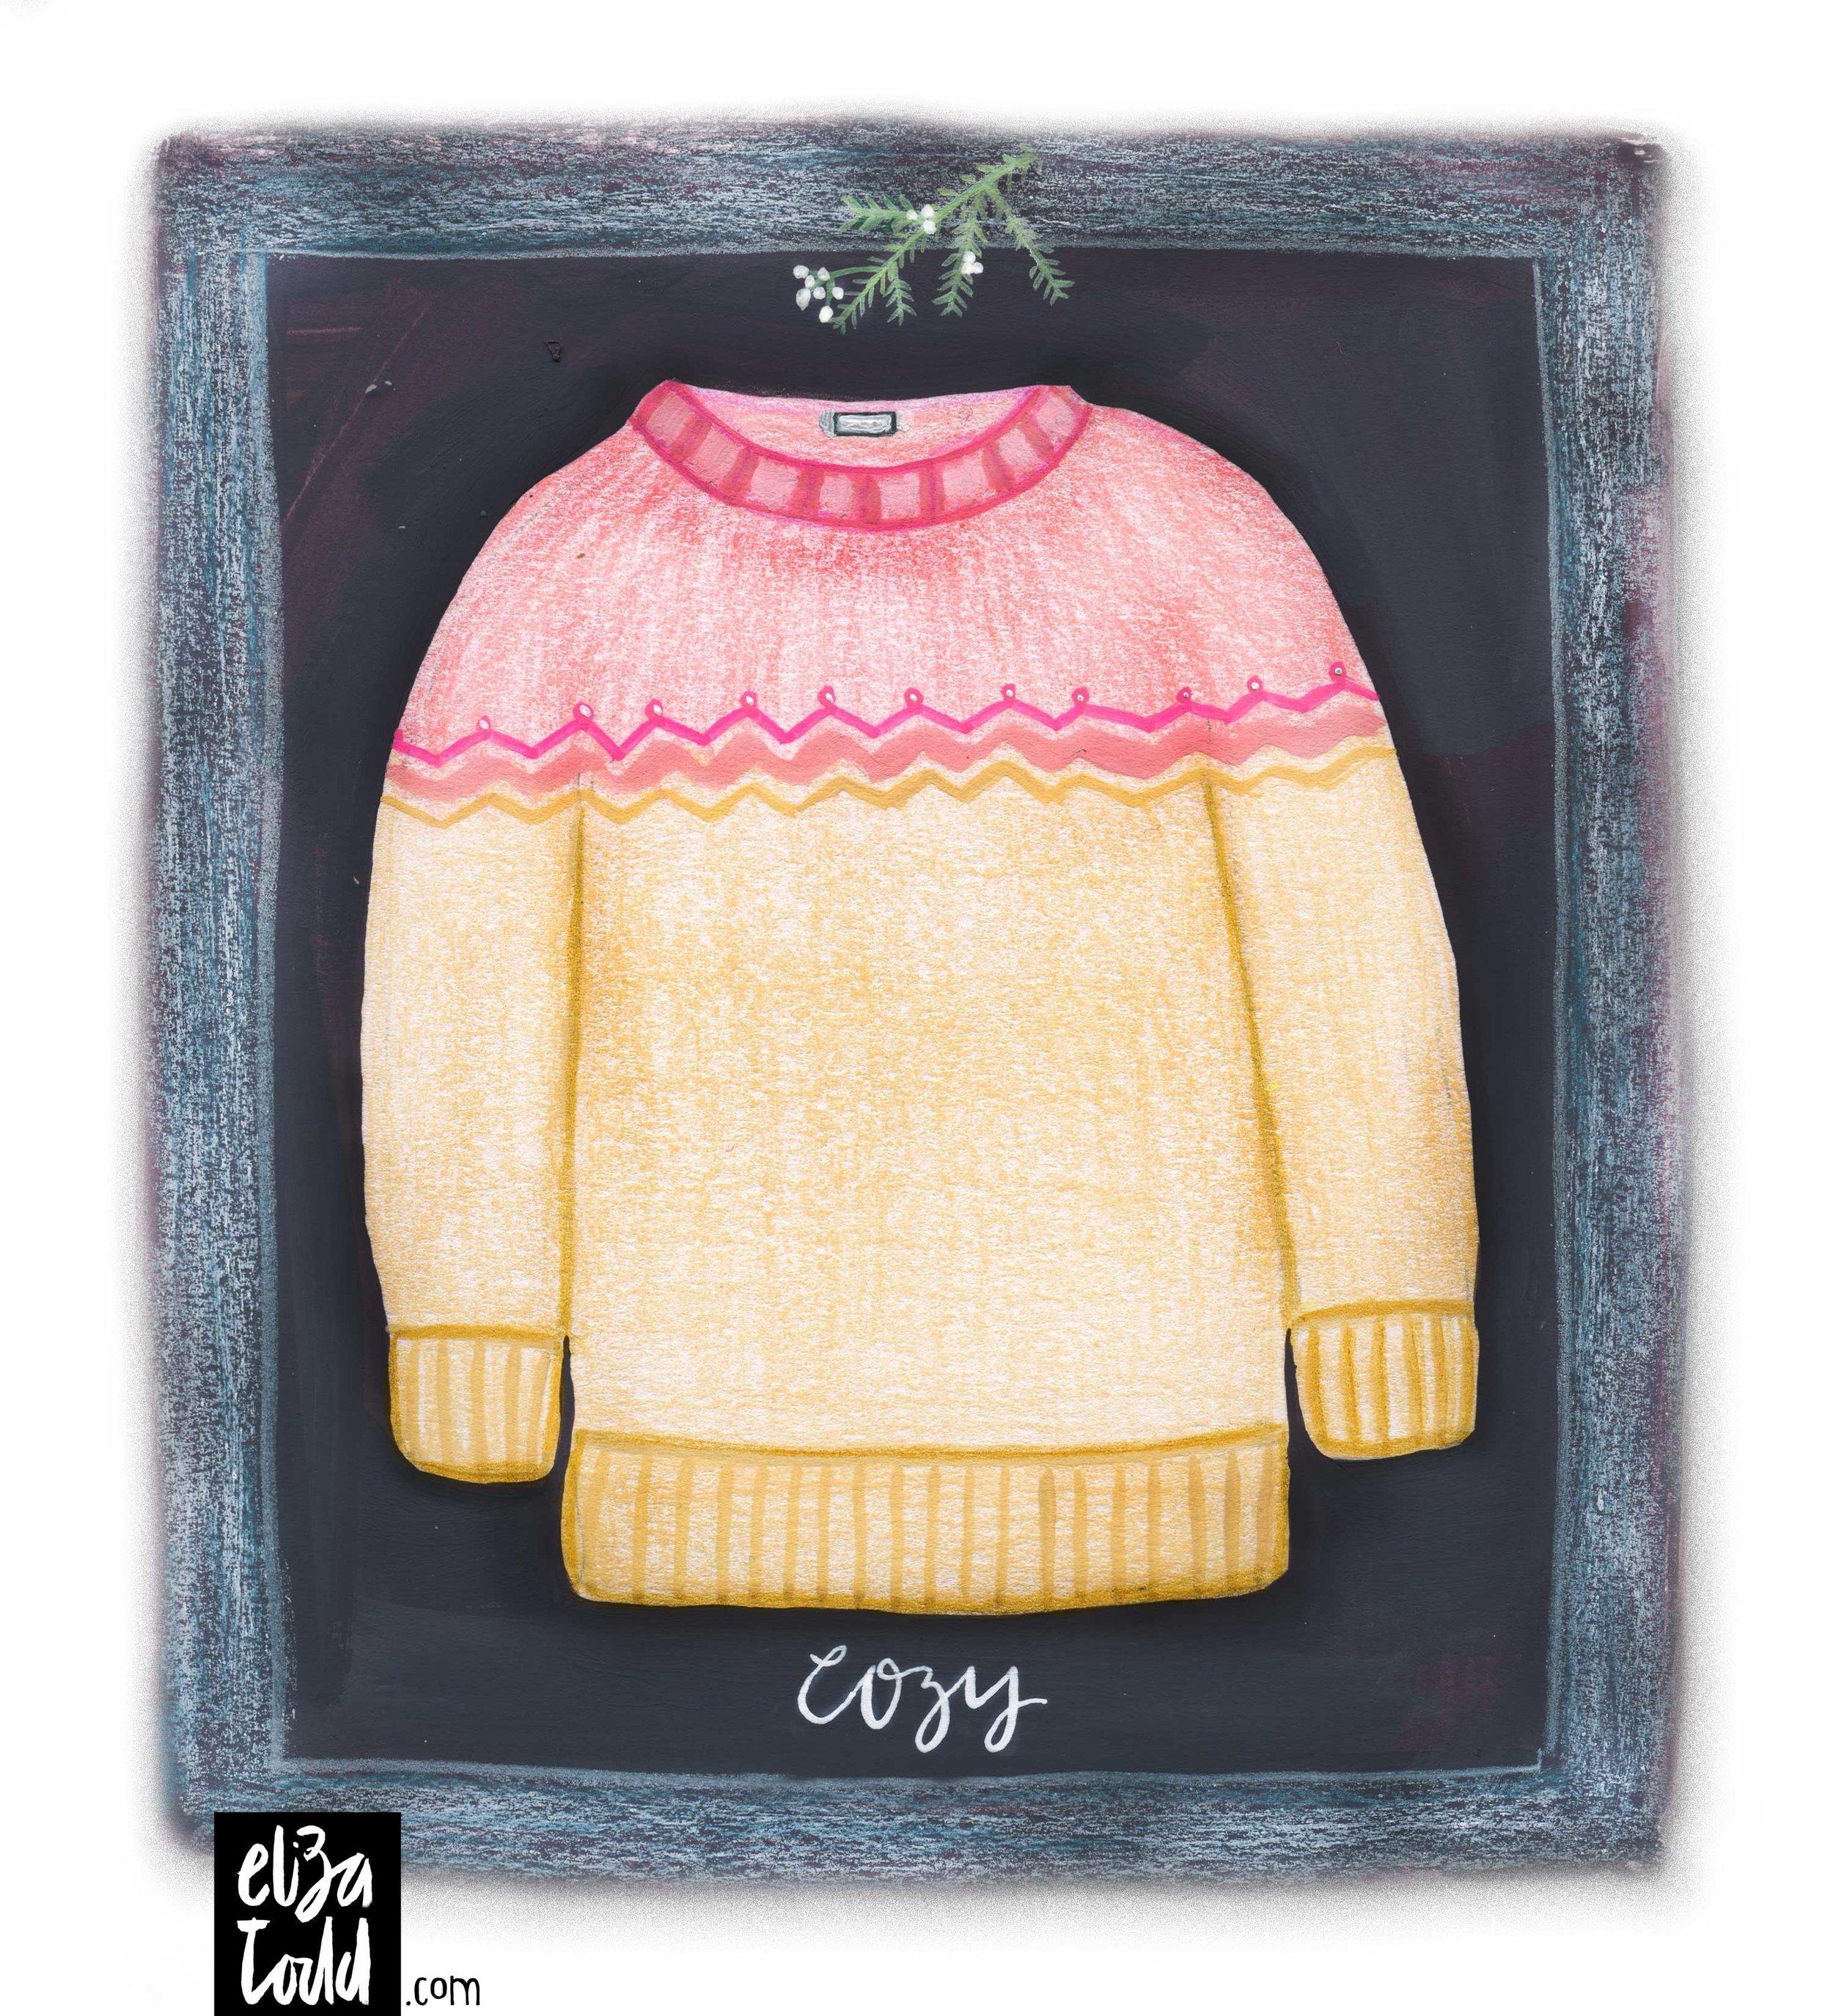 cozy-sweater.jpg